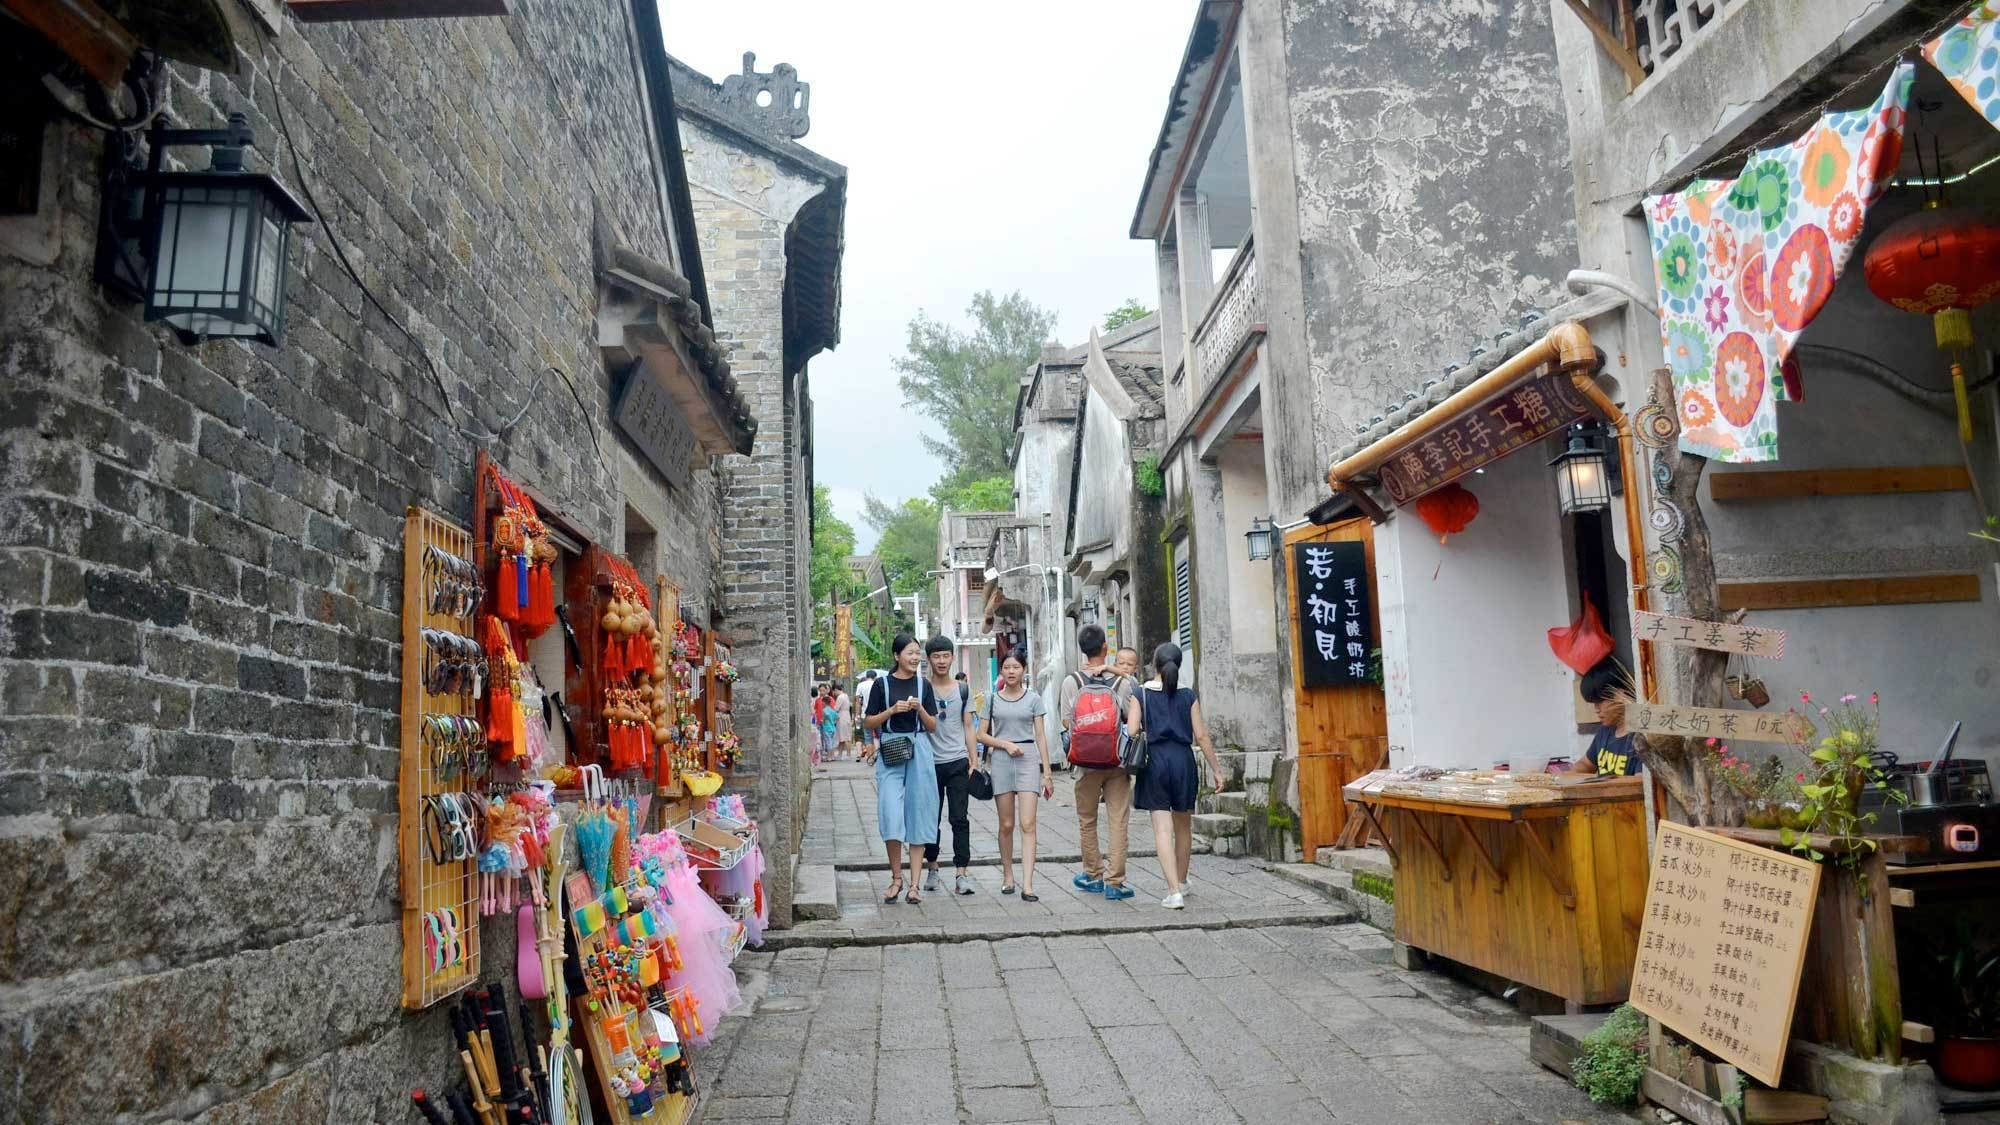 Street view in Shenzhen, China